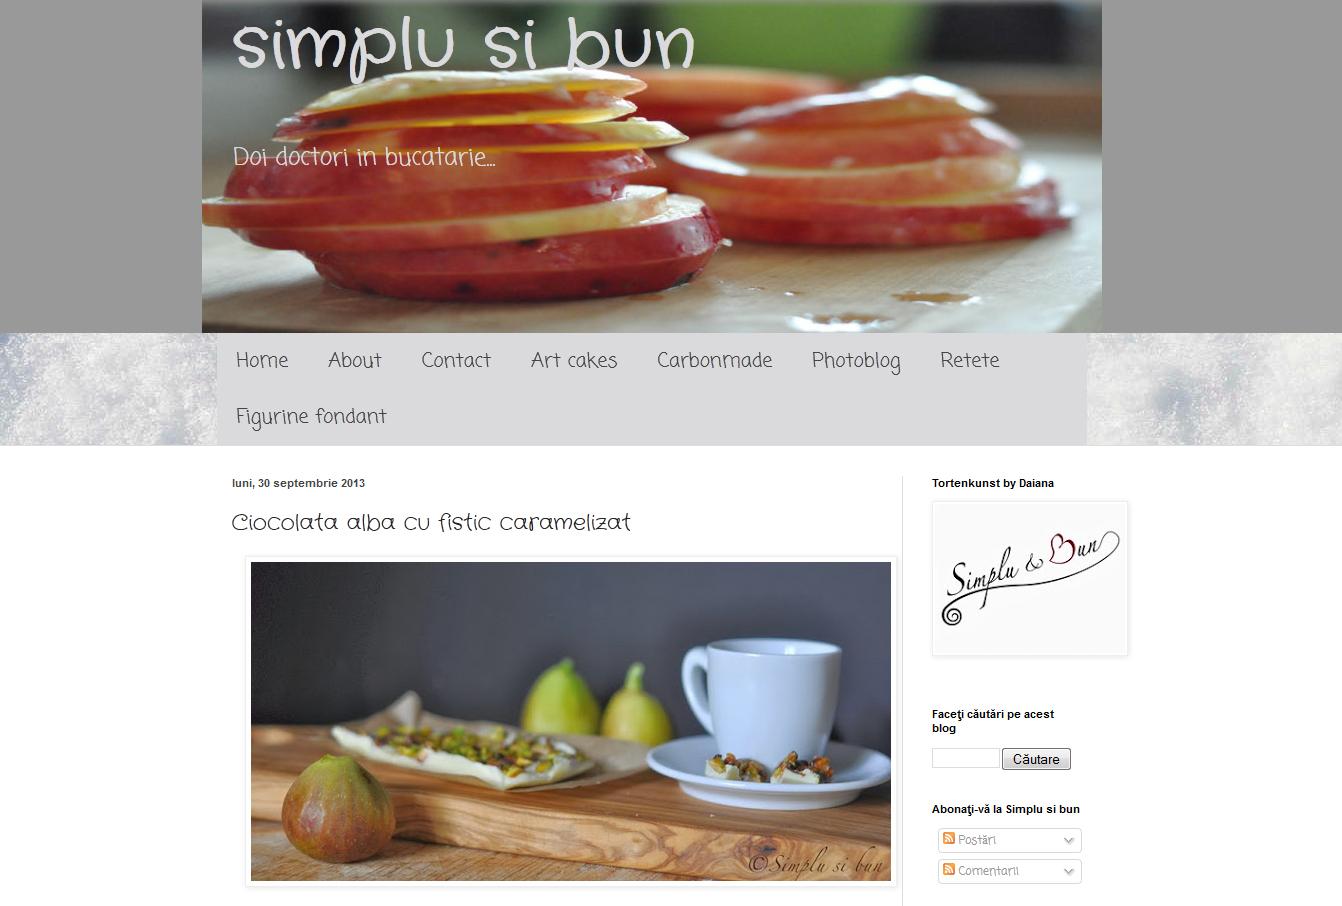 http://www.simplusibun.ro/